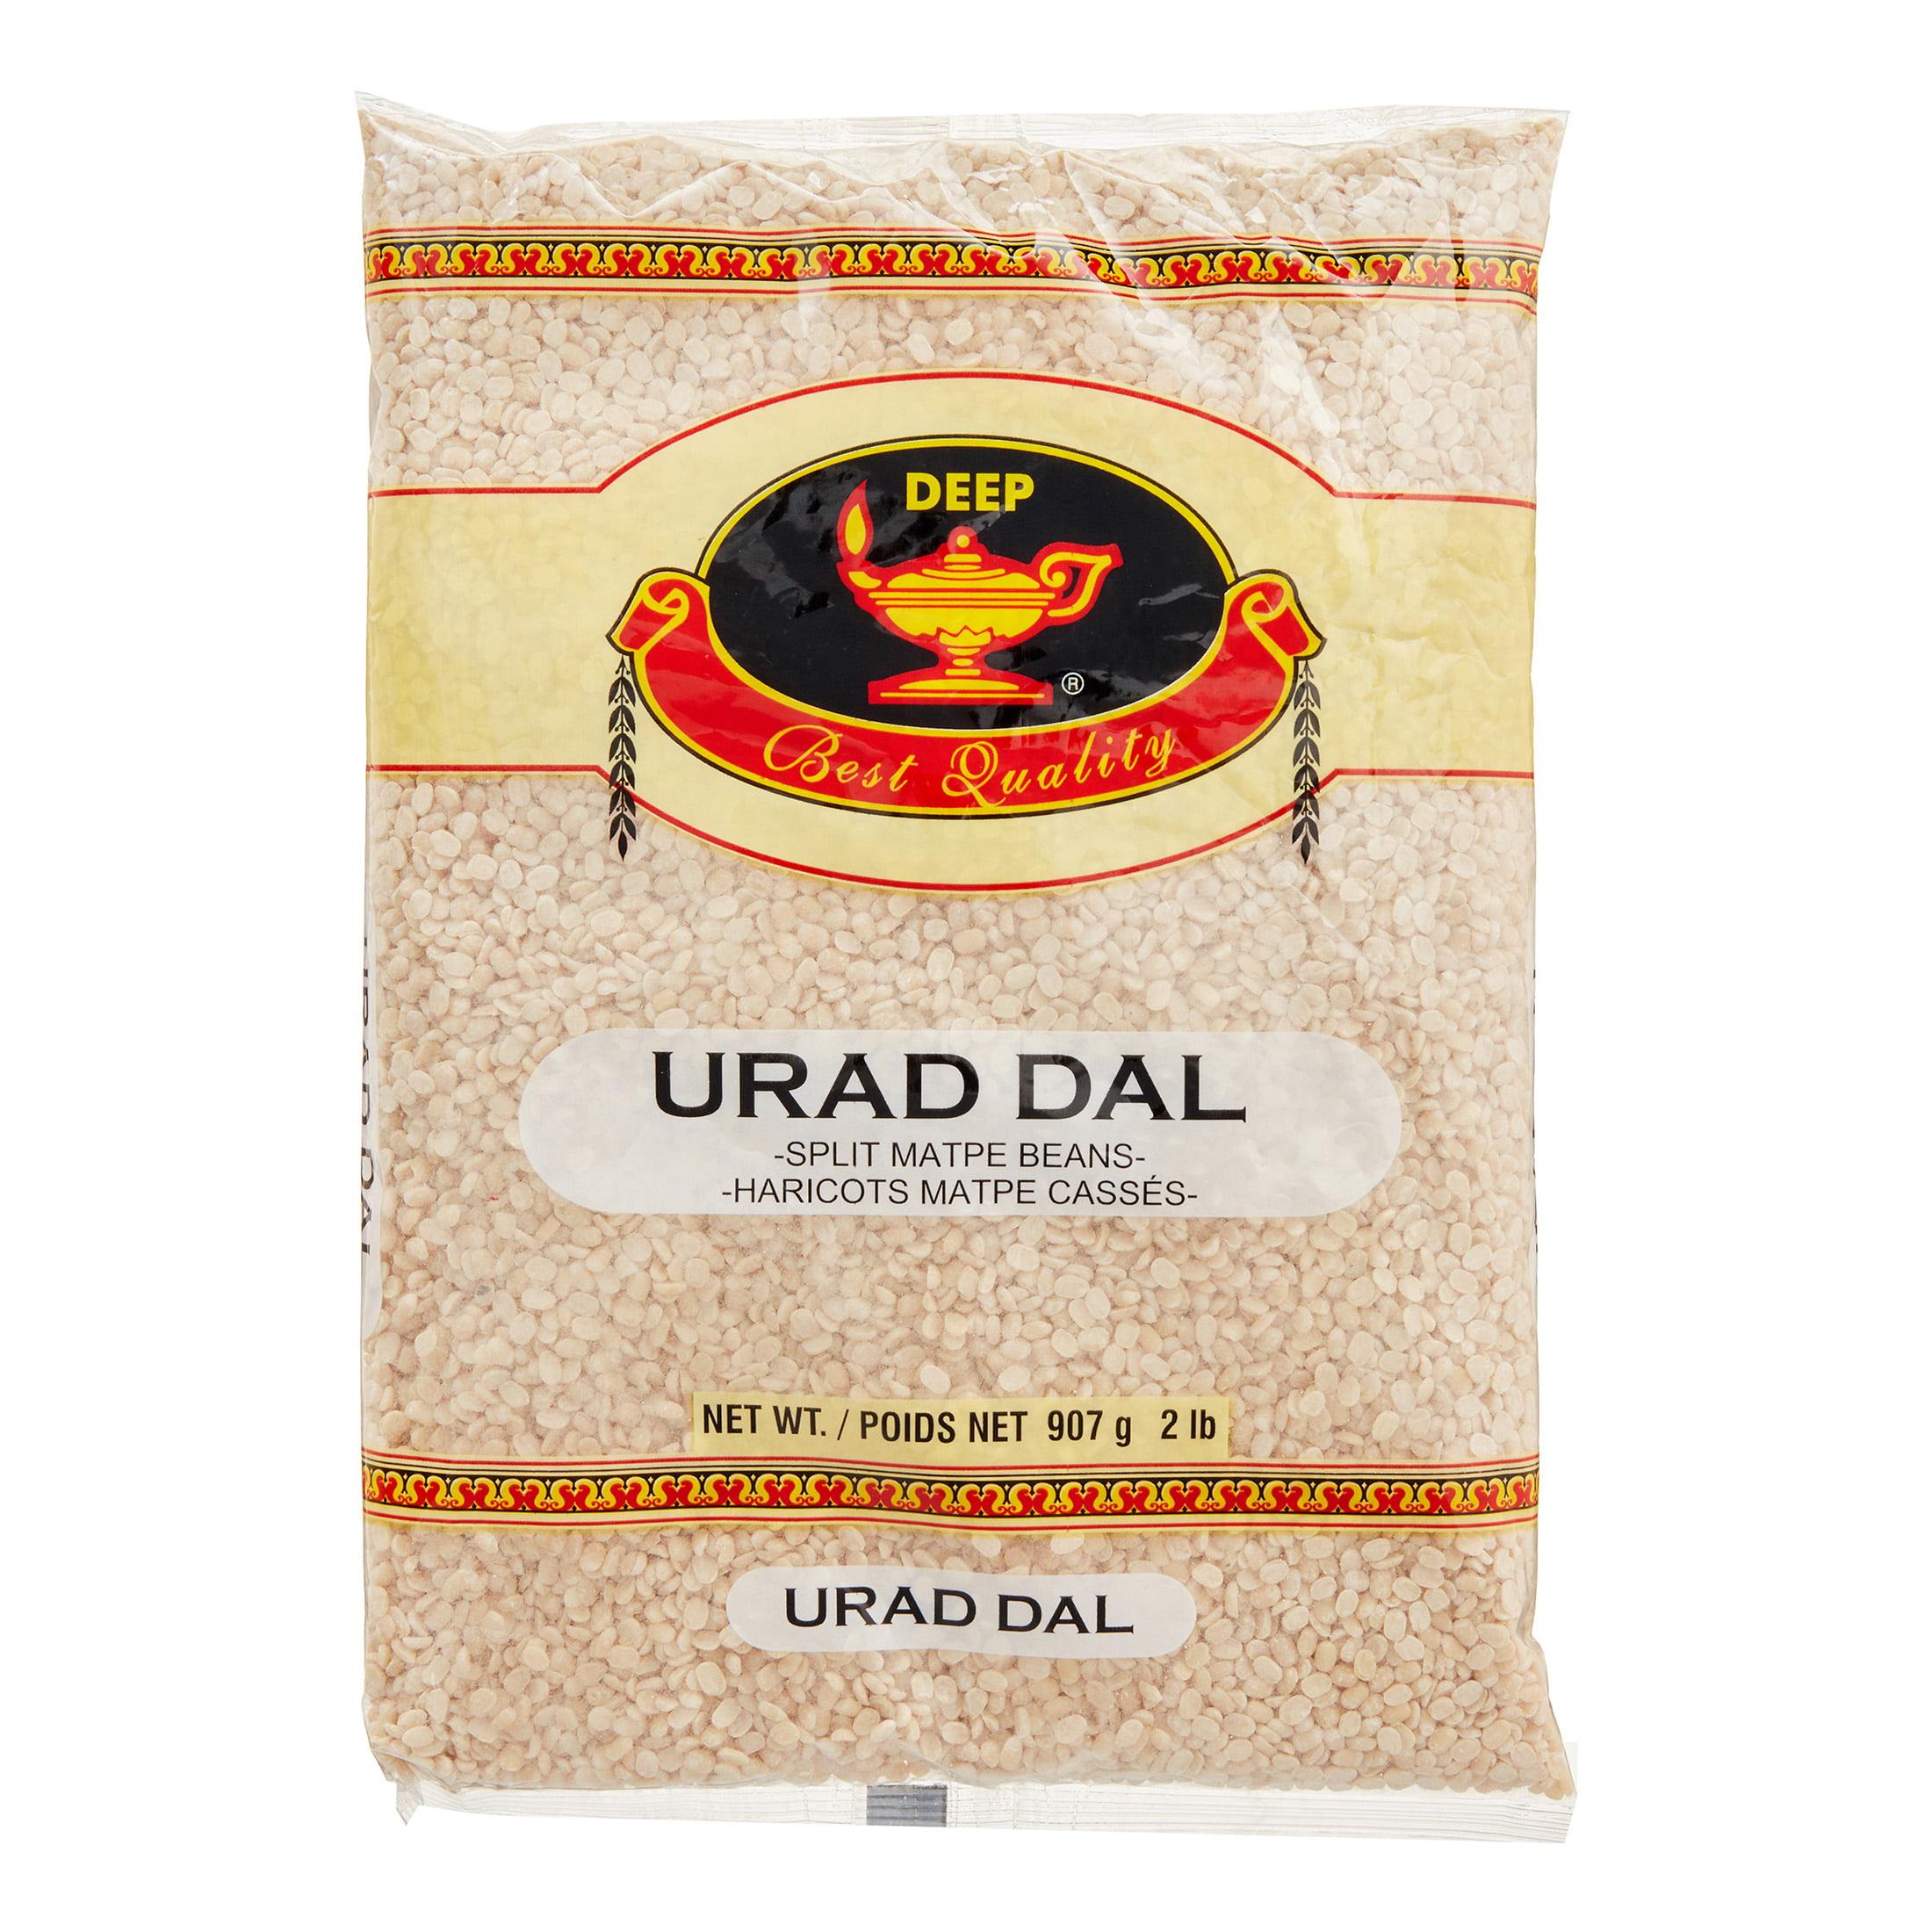 Deep Urad Dal, 2 Lb by Chetak New York LLC